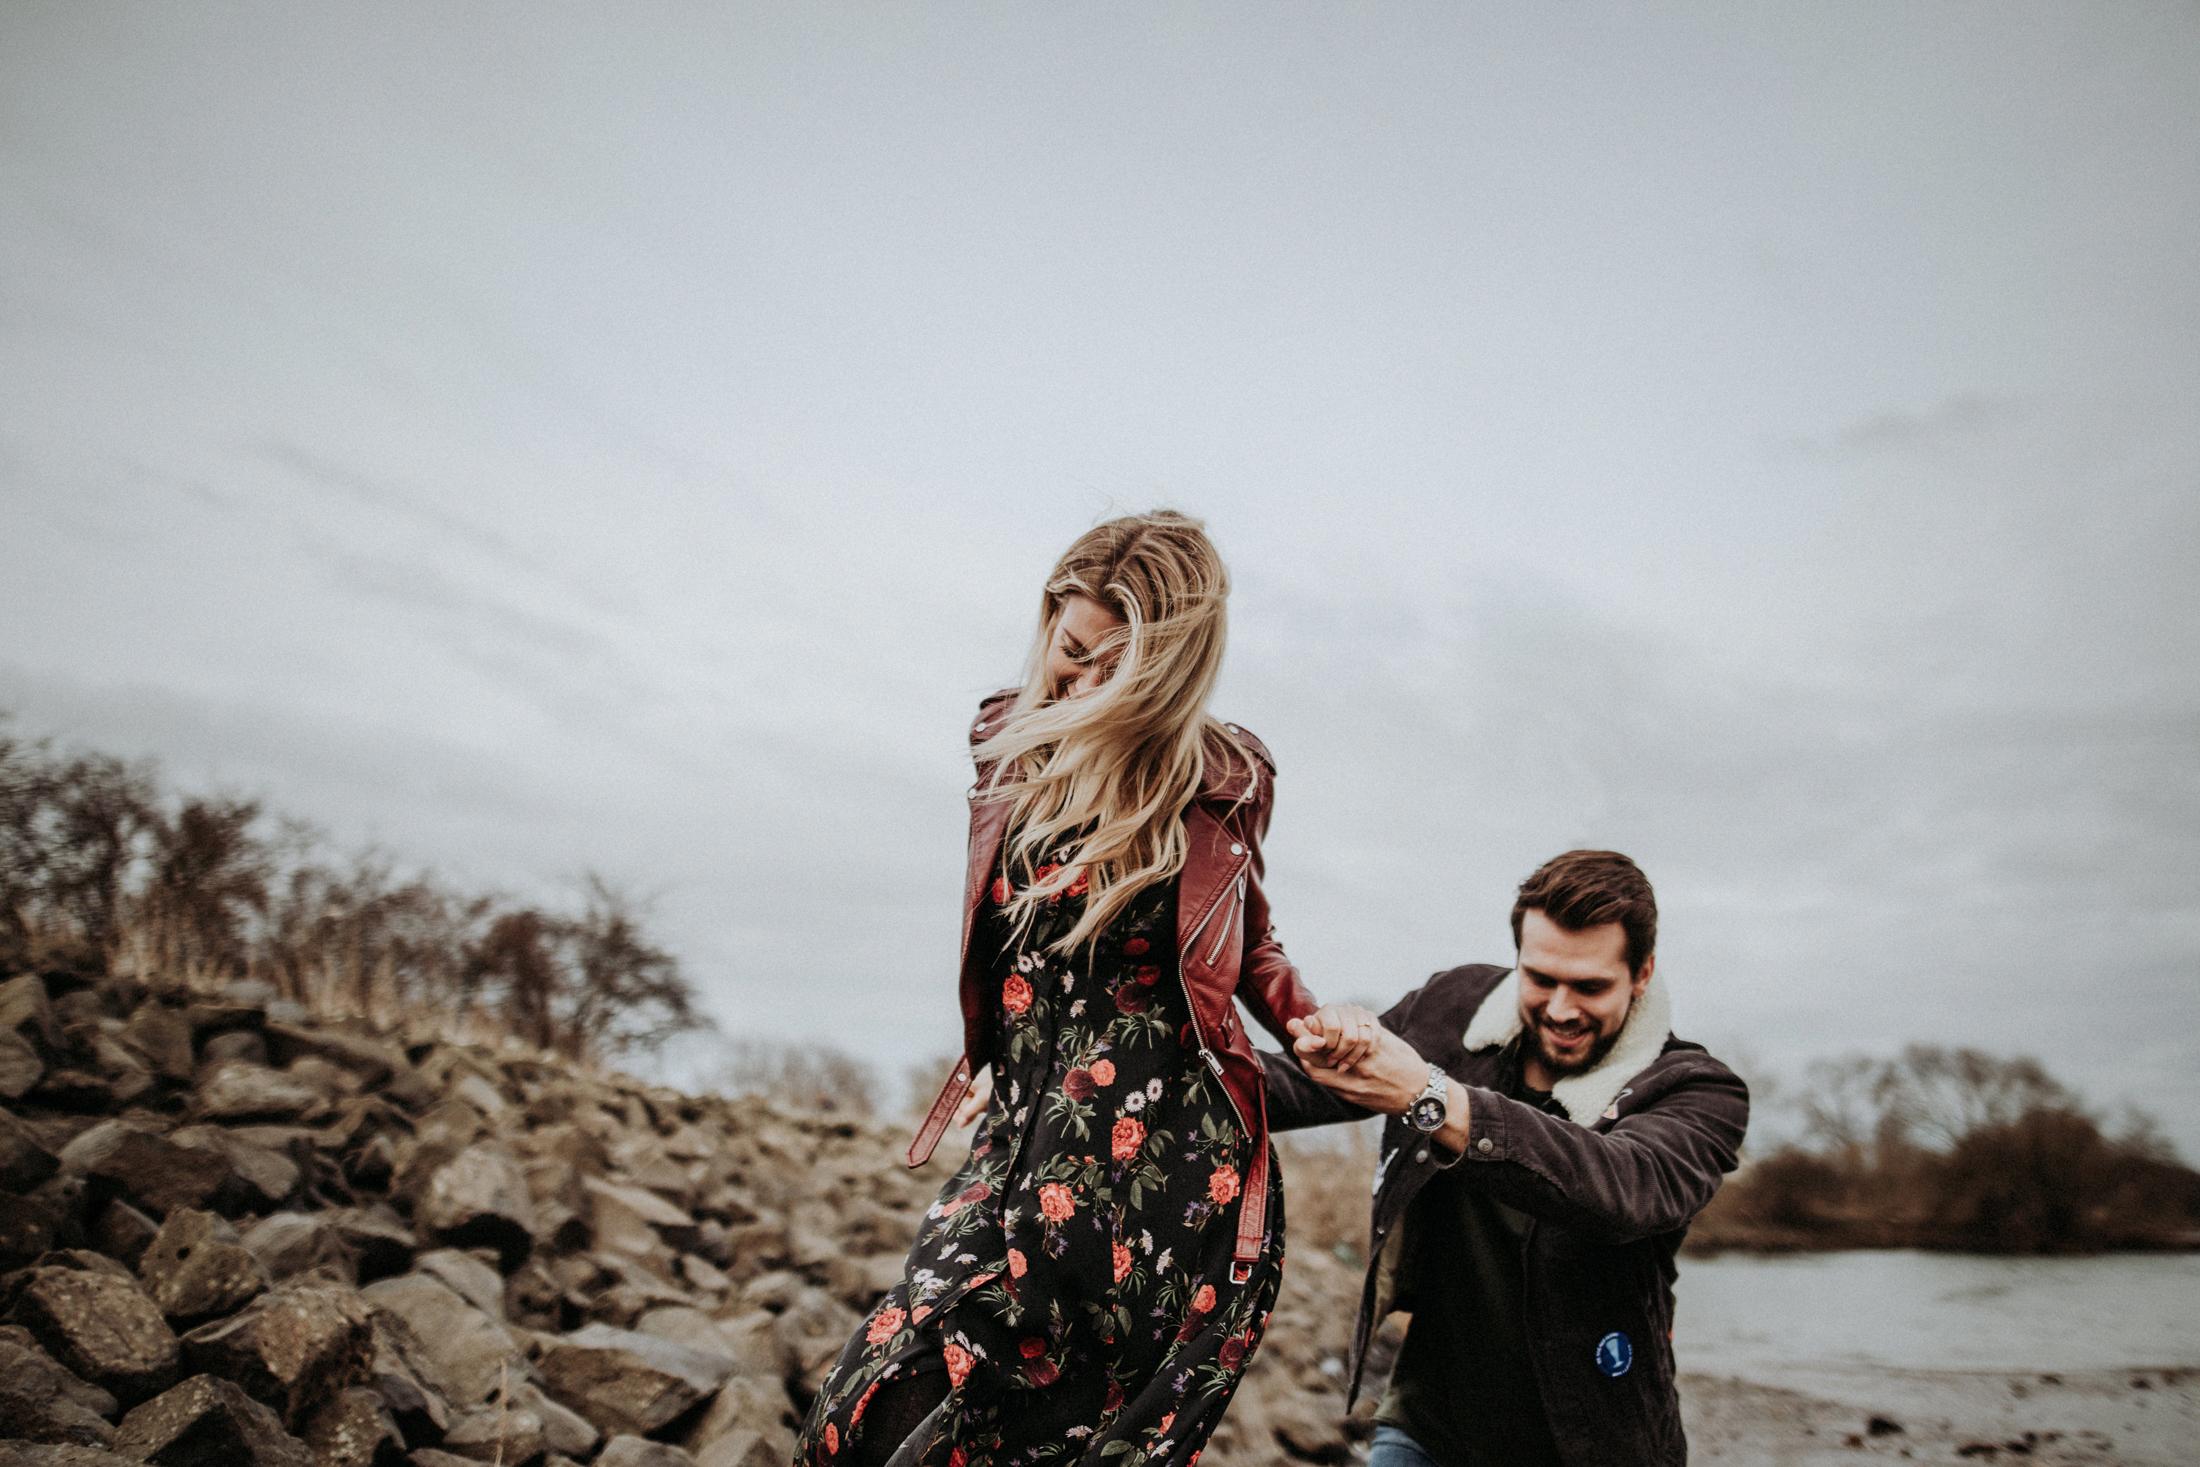 Wedding_Photographer_Mallorca_DanielaMarquardt_Photography_CanaryIslands_Lanzarote_Iceland_Tuscany_Santorini_Portugal_NewYork_Spain_Elopement_Hochzeitsfotograf_CK32